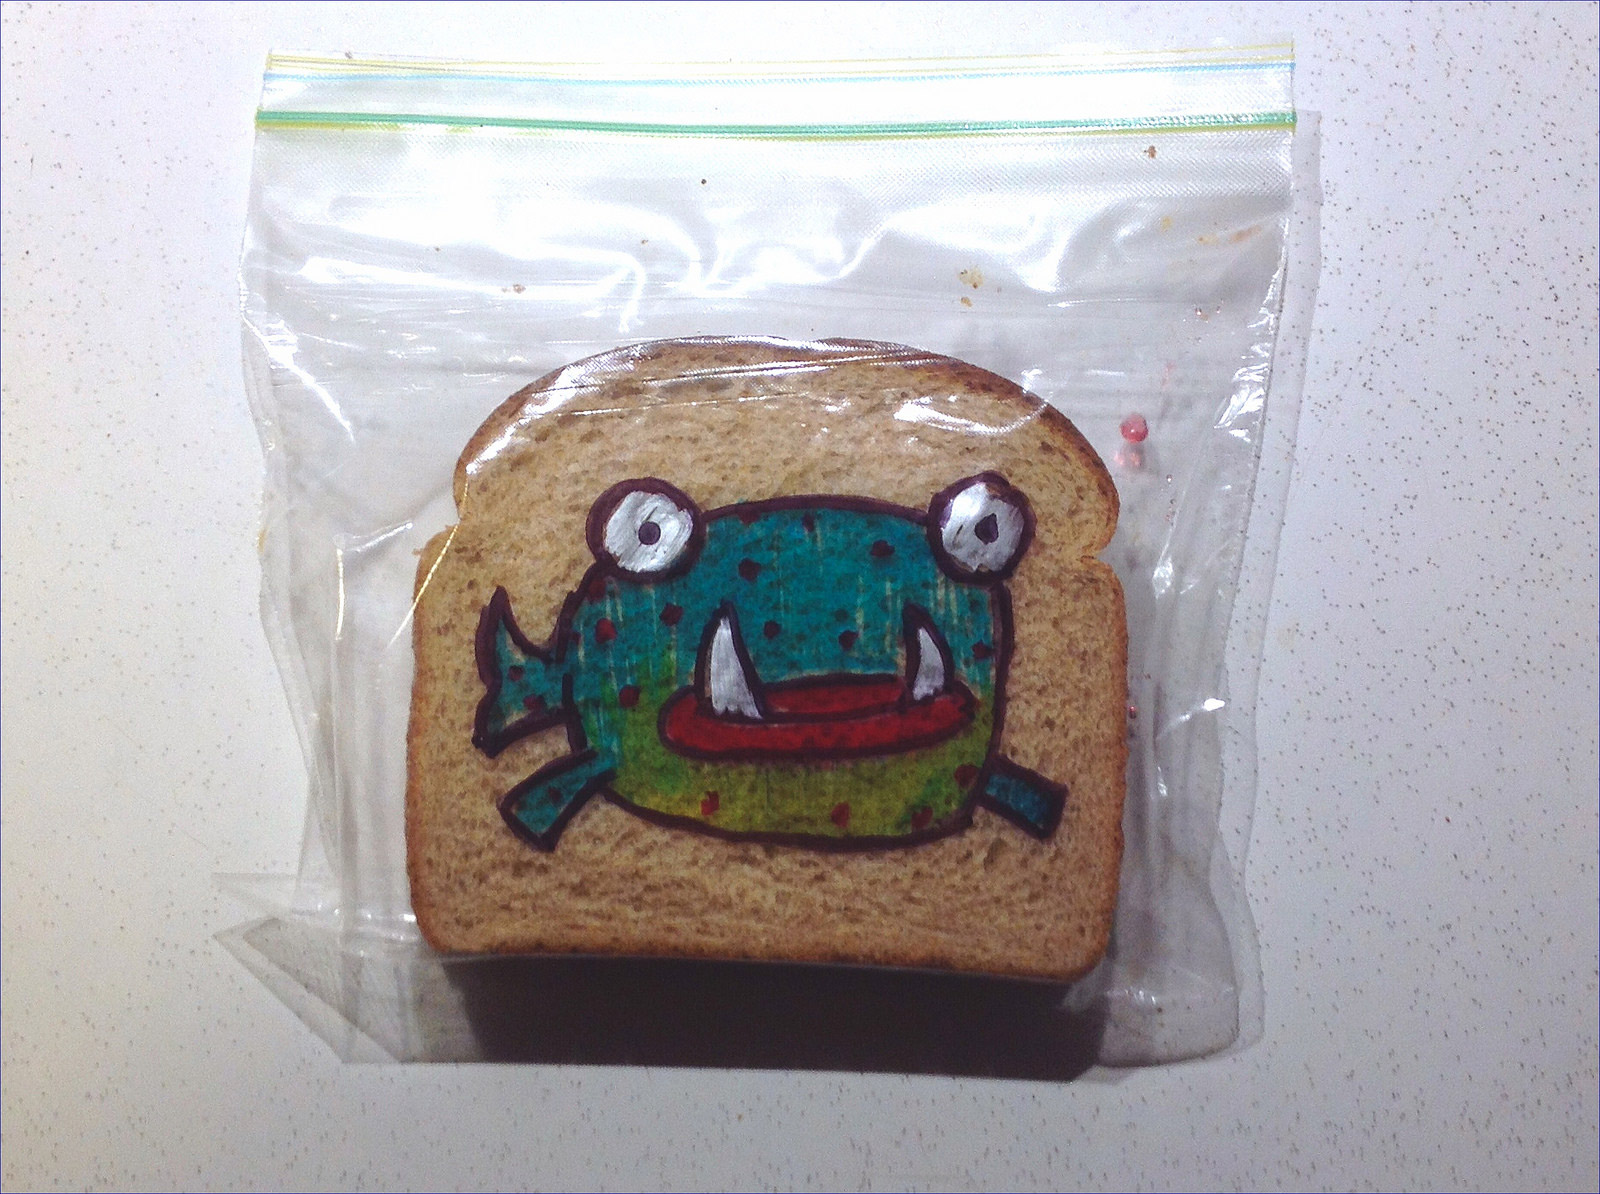 david-laferriere-creative-lunch-bag-illustration-21